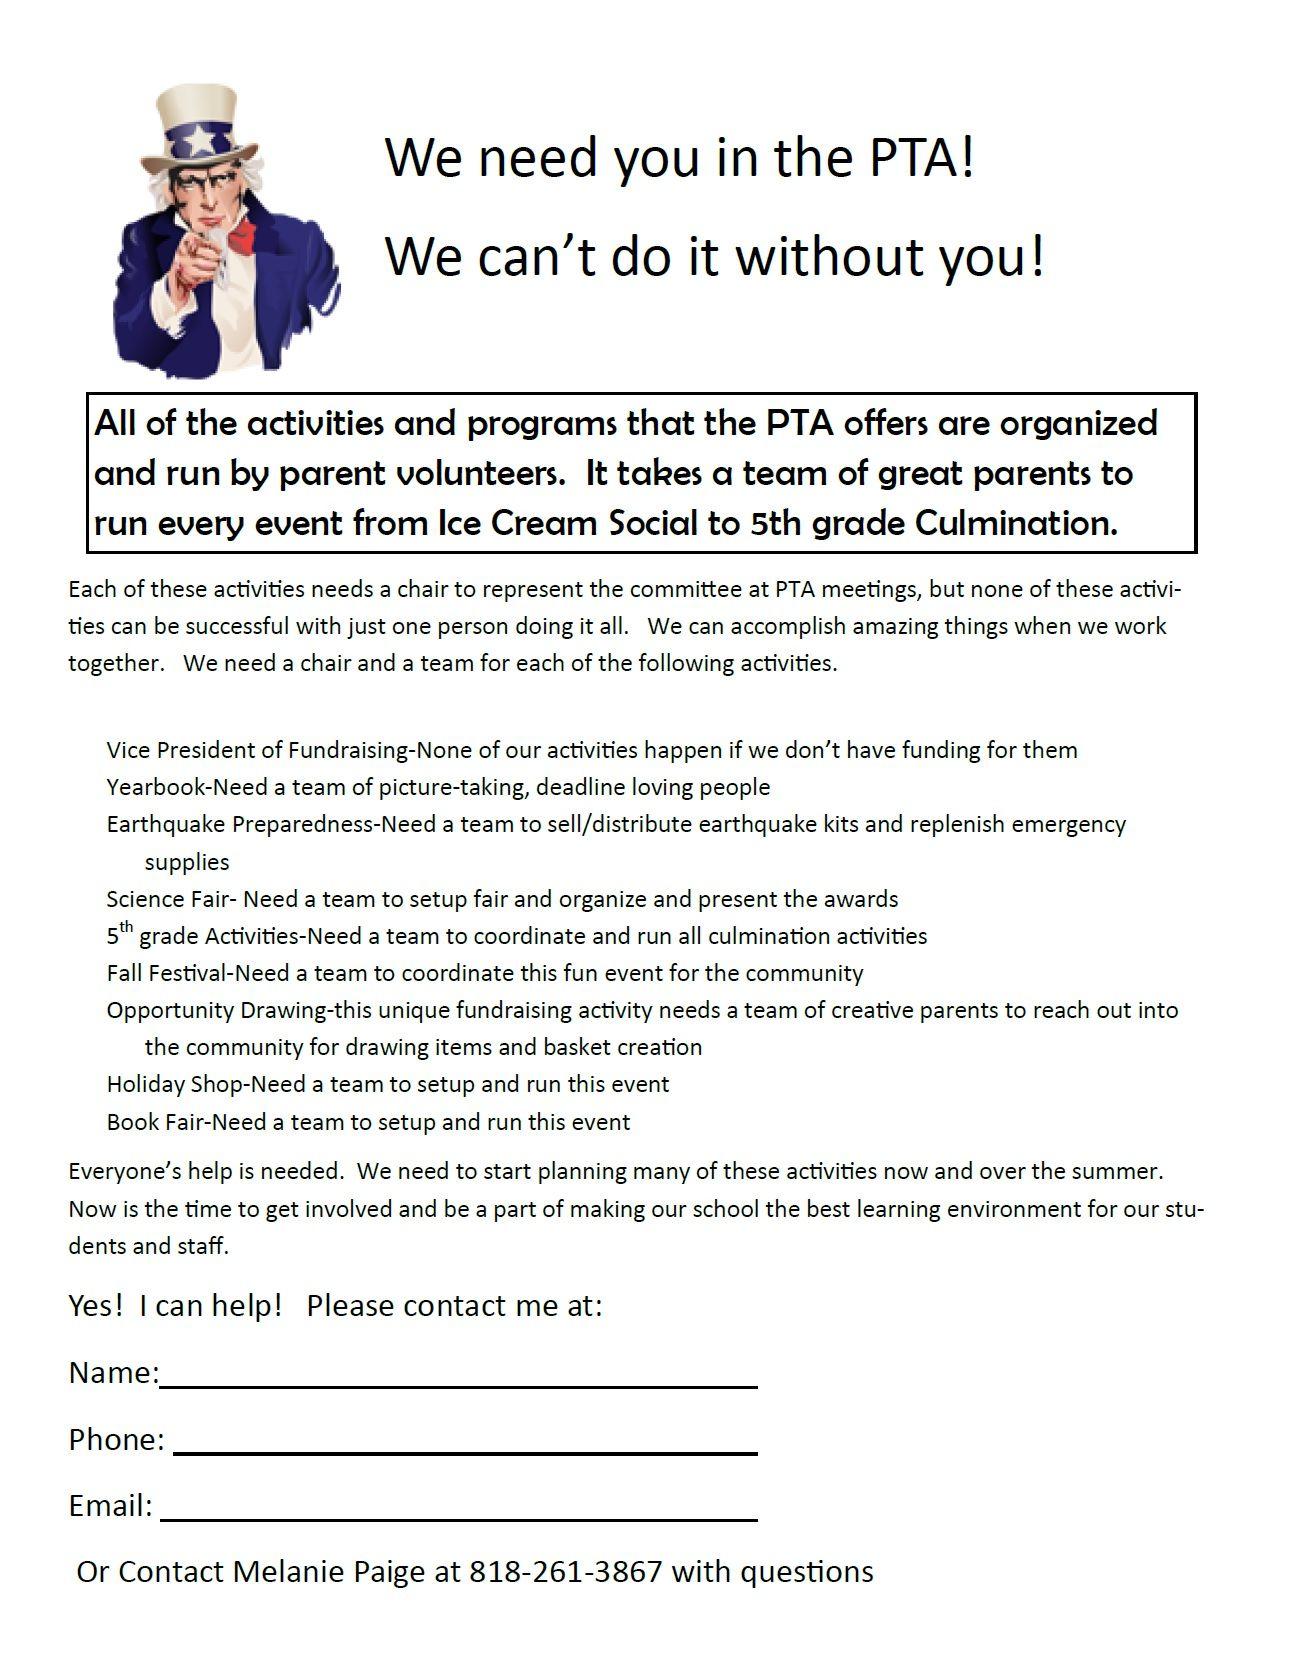 Ergonomic Chair Request Letter Safavieh Dining Chairs Canada High School Parent Volunteer Google